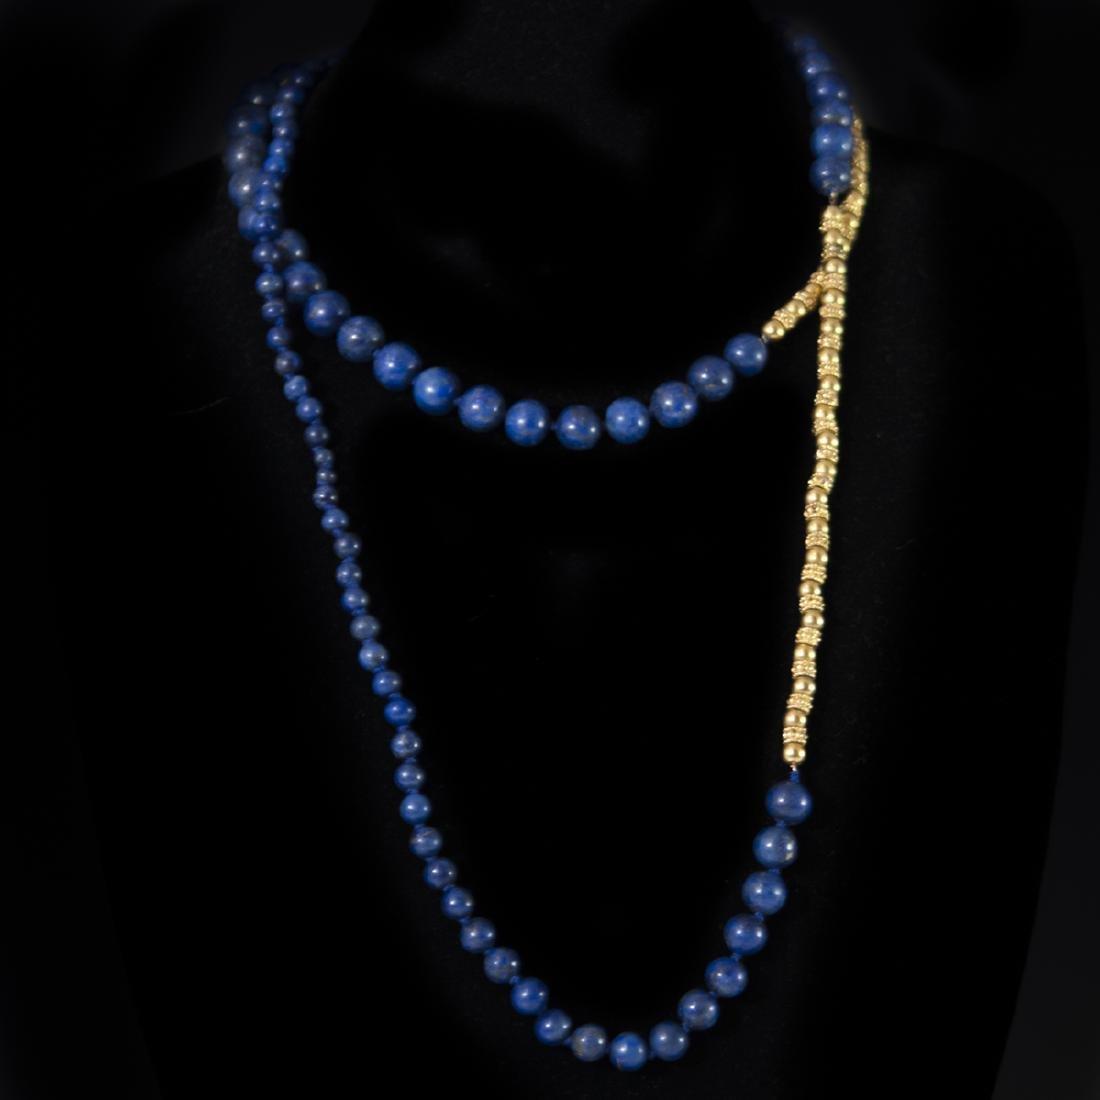 18kt Gold & Lapis Lazuli Necklace